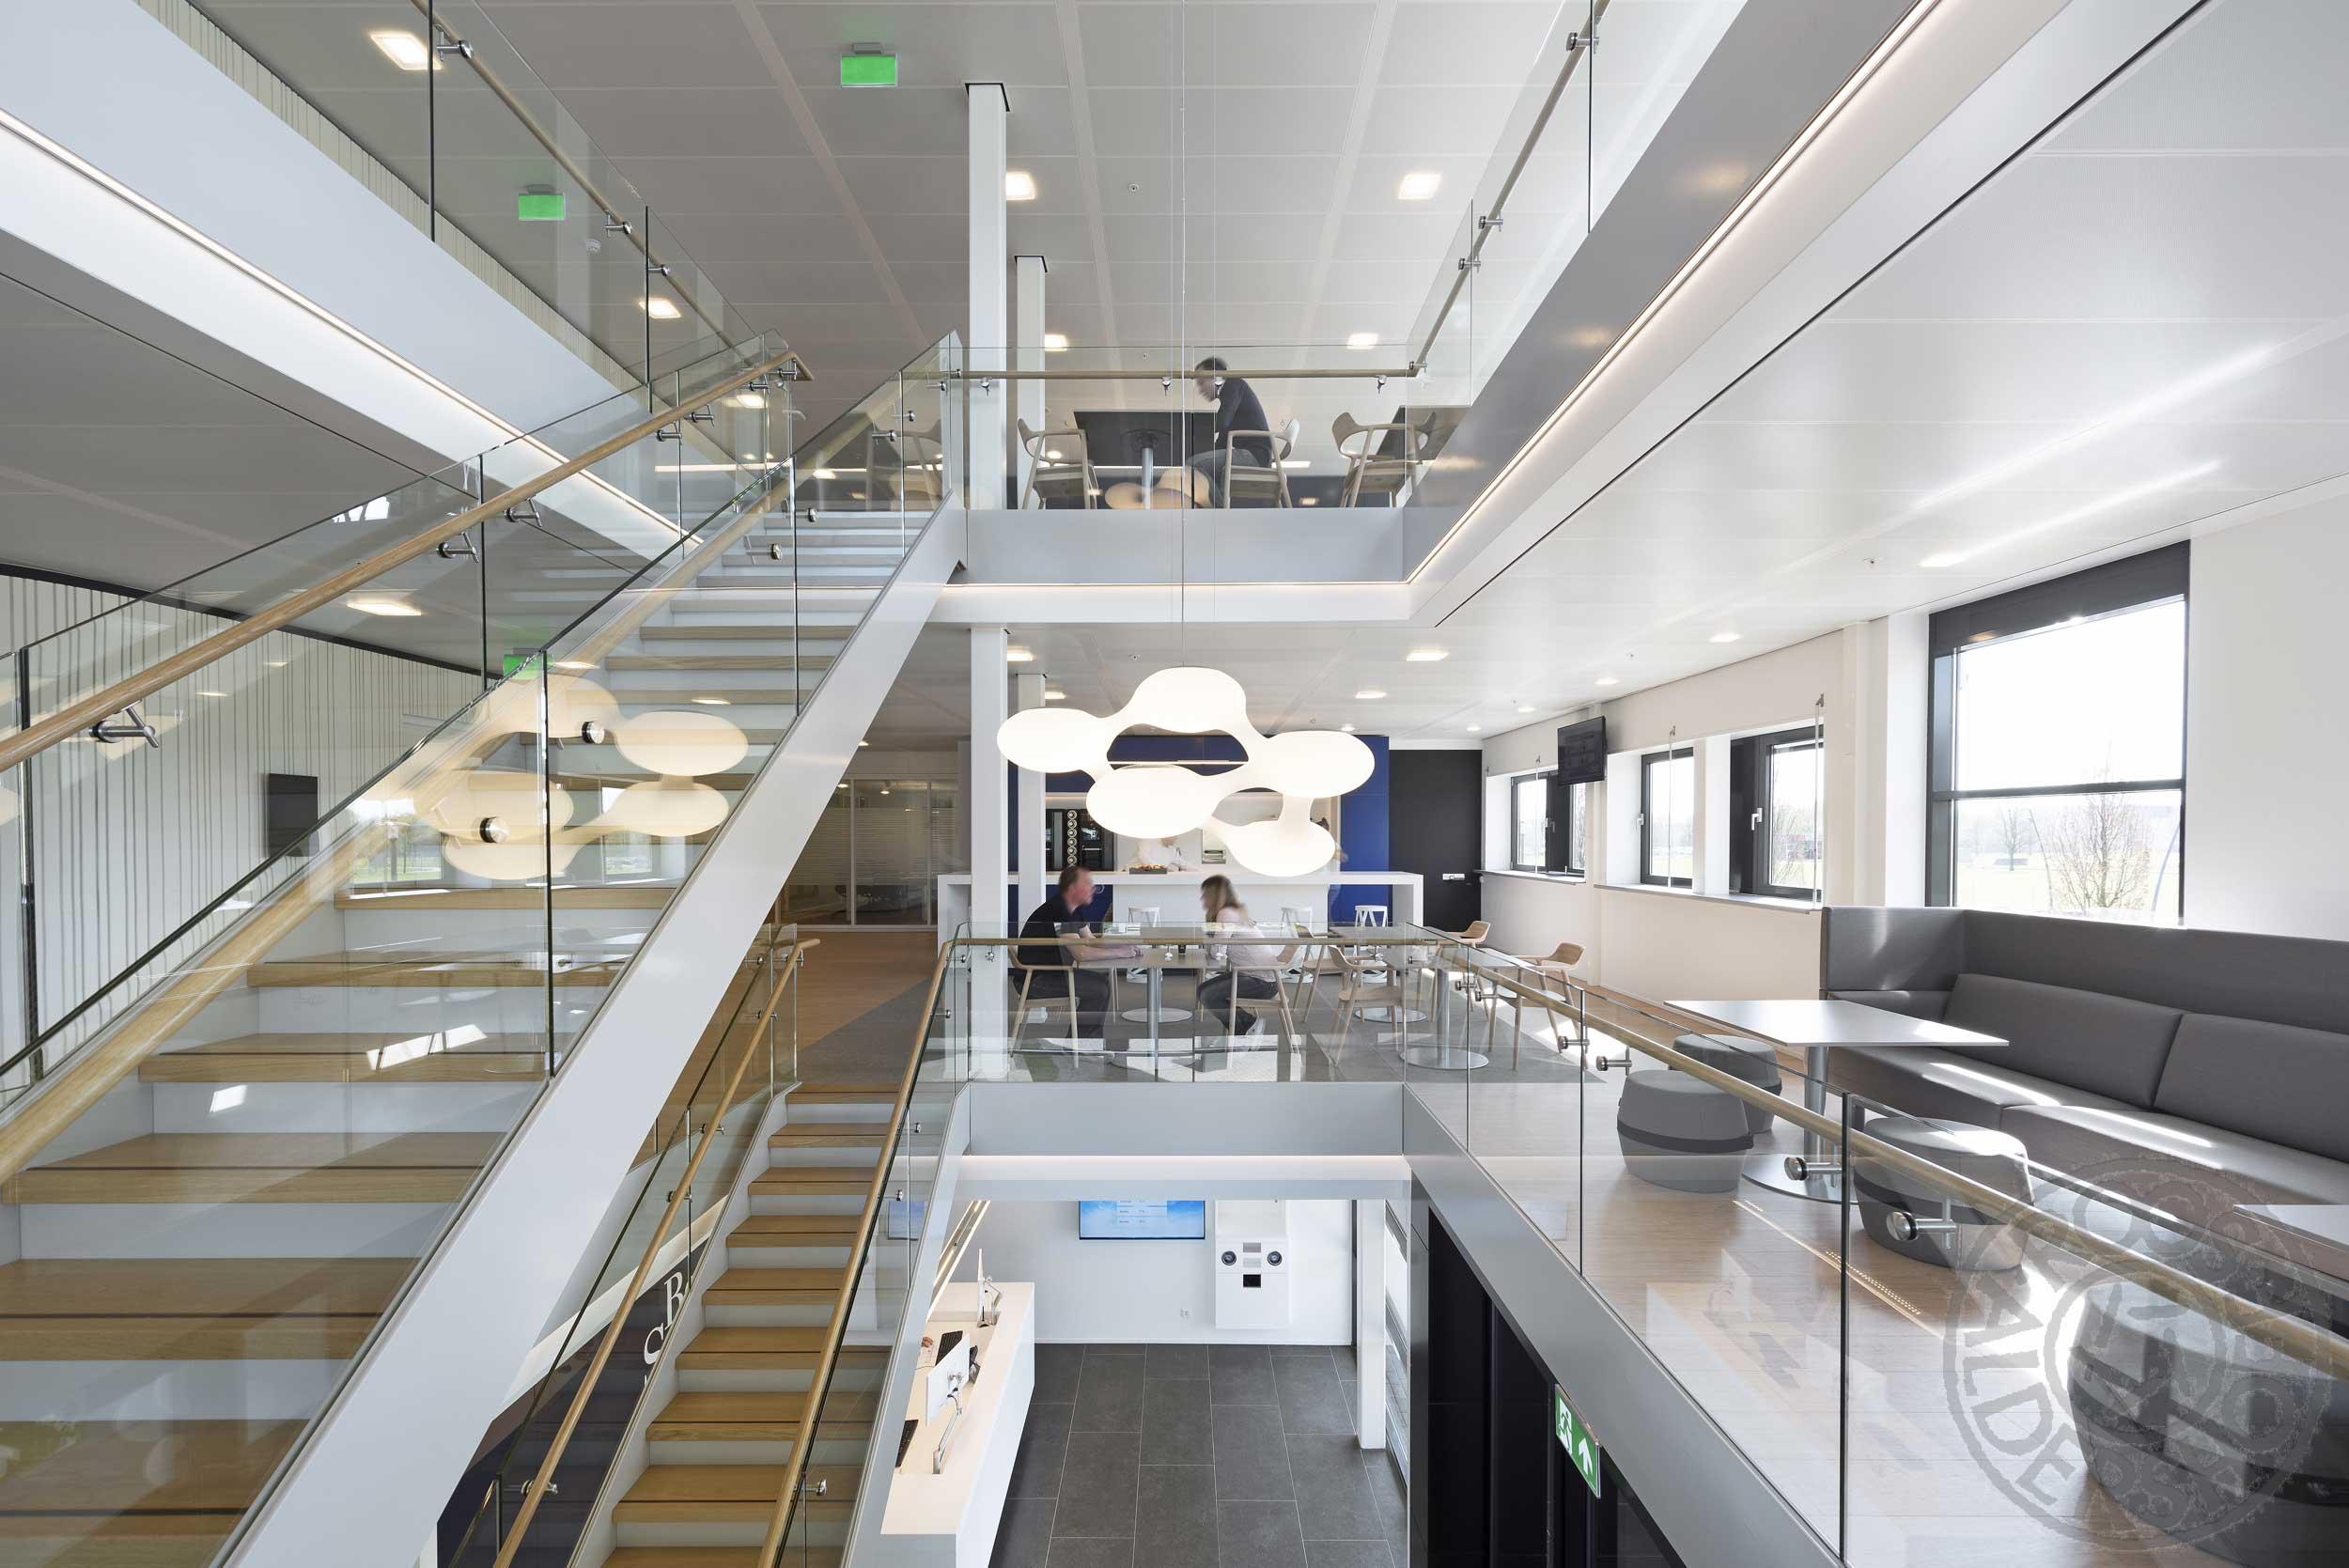 boston scientific international bv n interieurarchitecten en n architecten